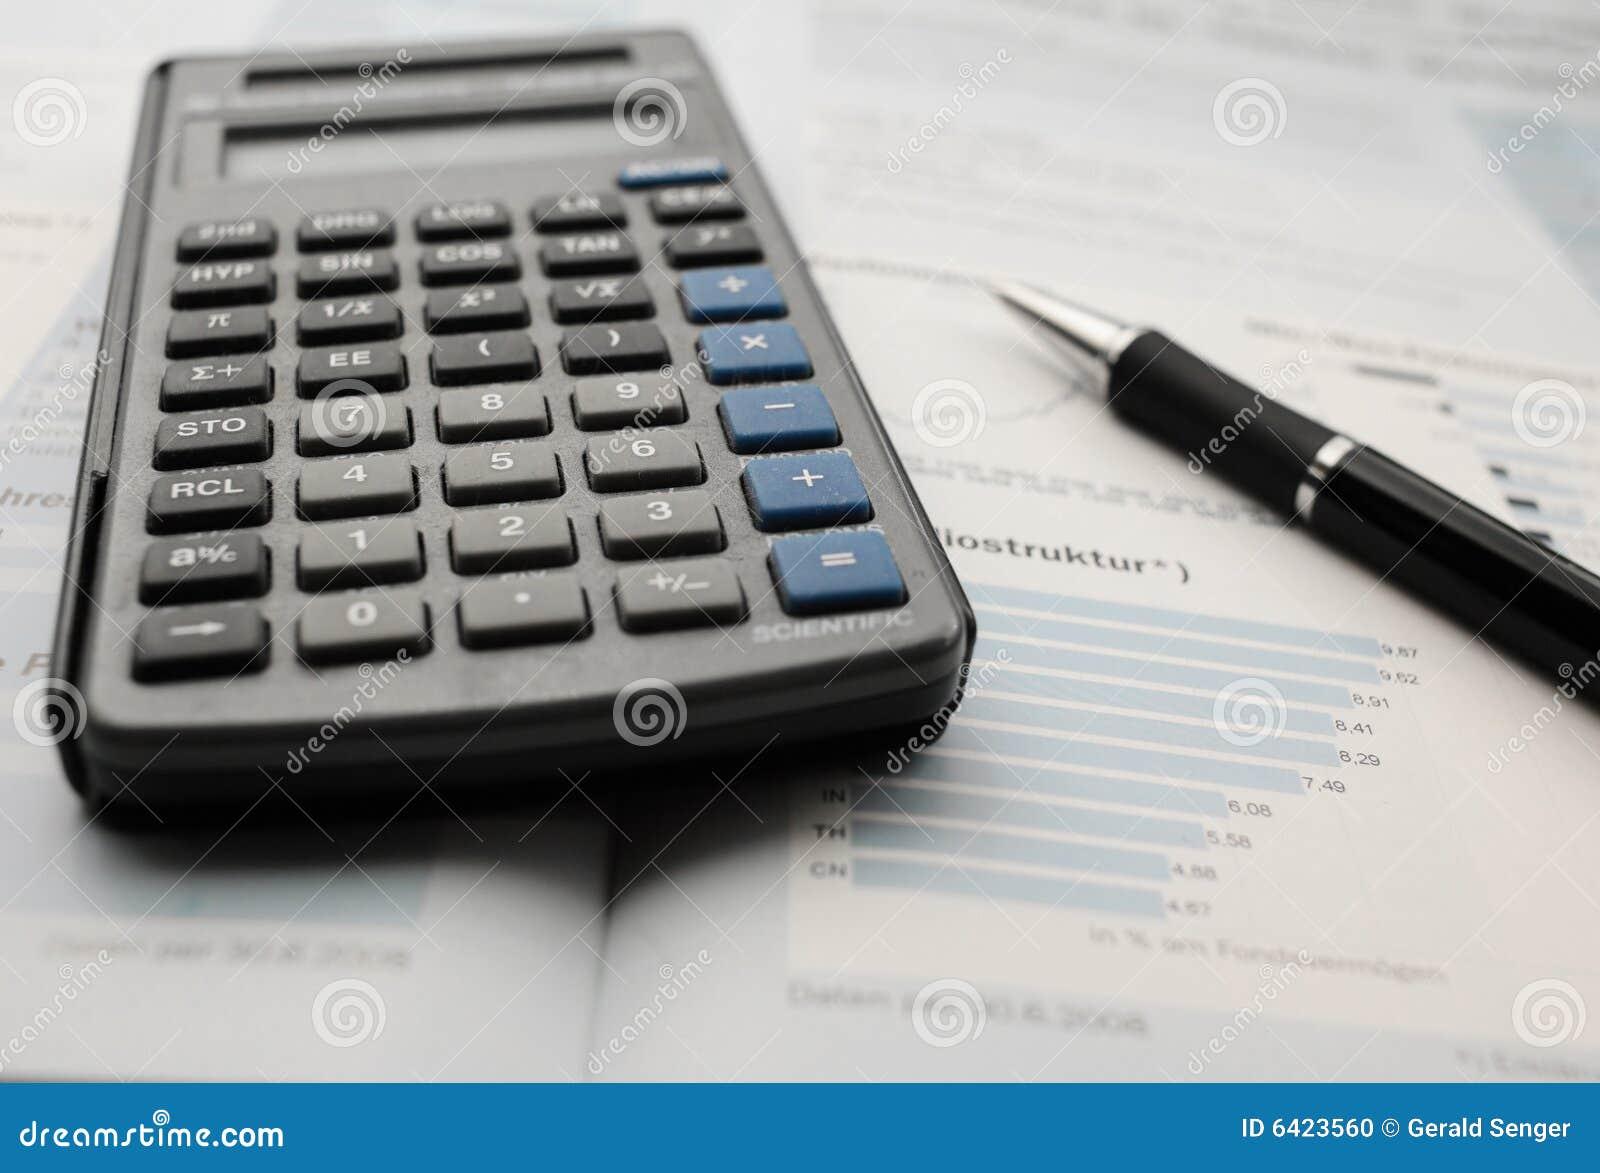 hand calculator